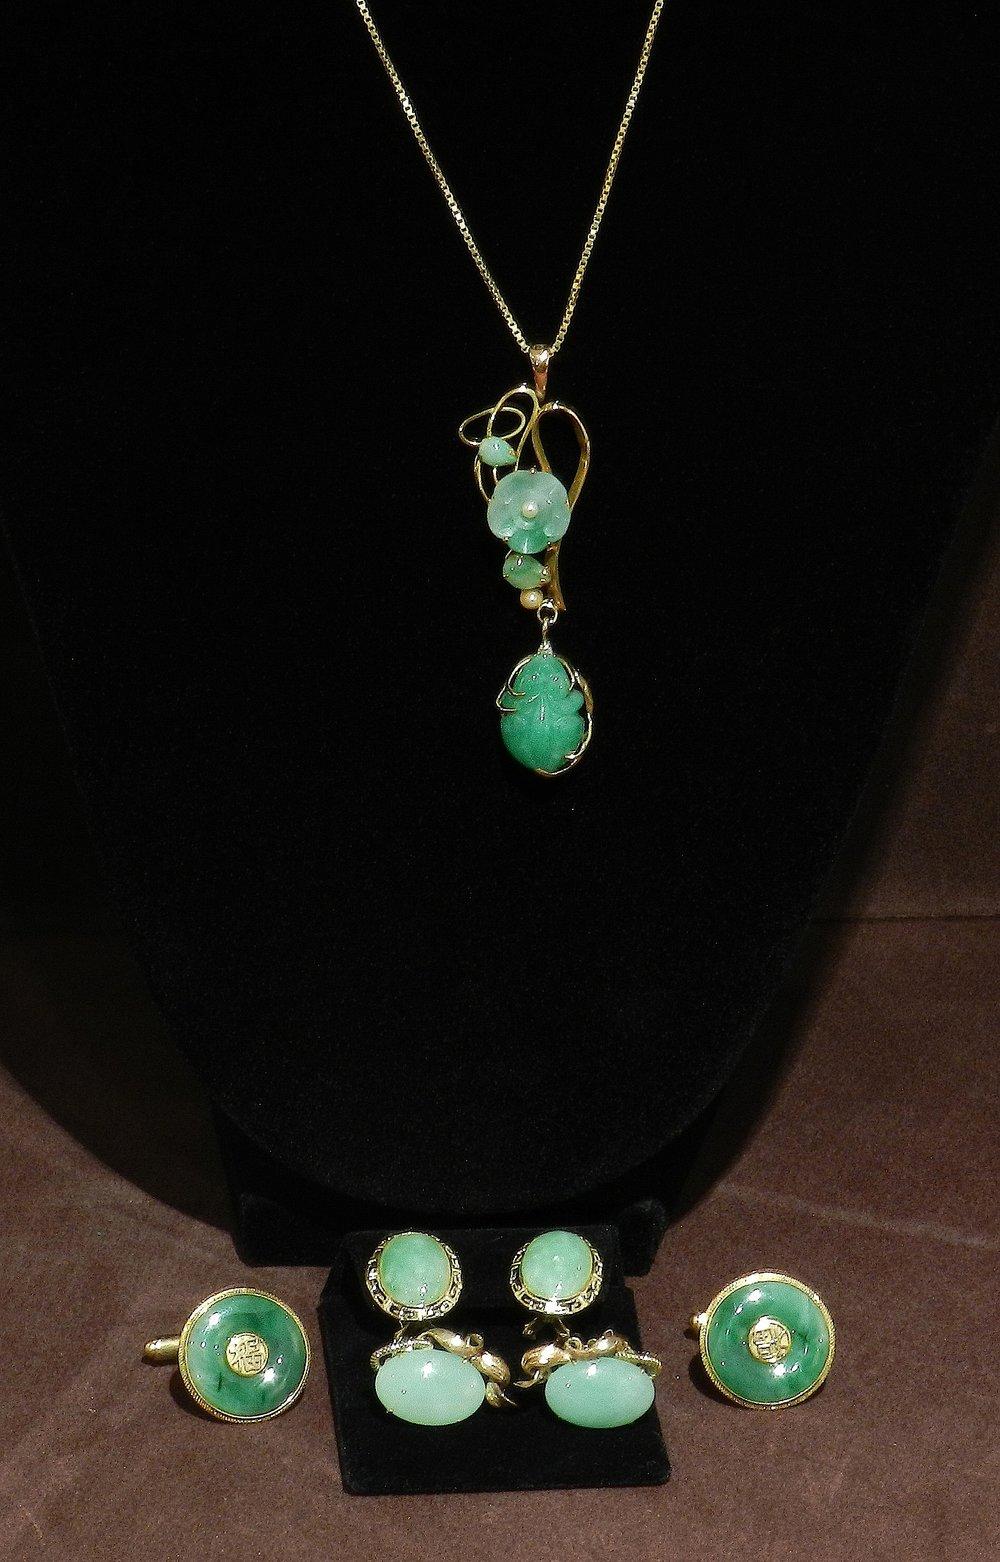 Assortment of Chinese Jadeite Jewellery